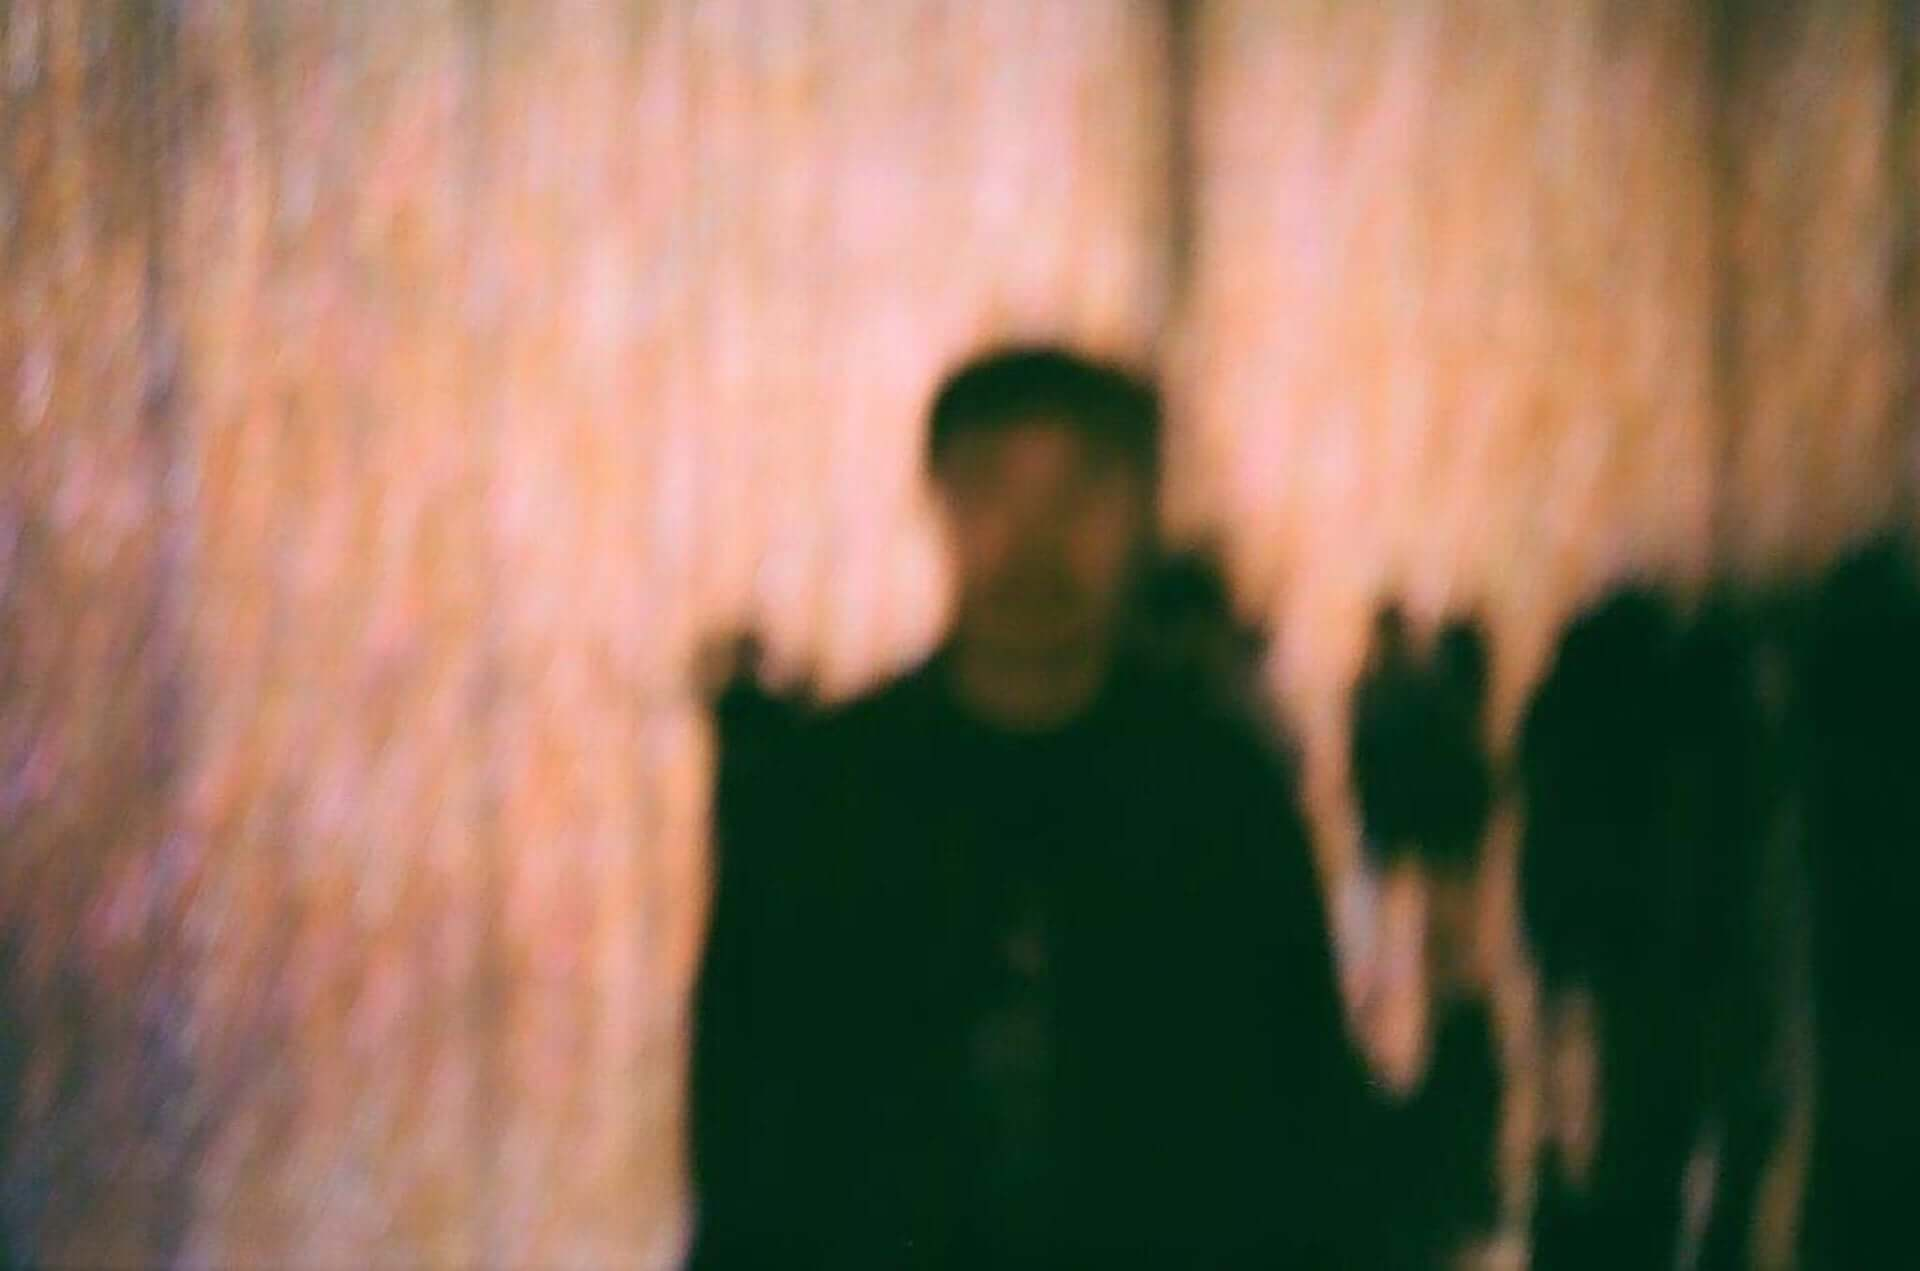 ermhoiがD.A.N.のDaigo Sakuragiを迎えた新EP『E』をリリース!本日放送の『Mステ』3時間SPにはmillennium paradeとして出演 music210219_ermhoi_4-1920x1271